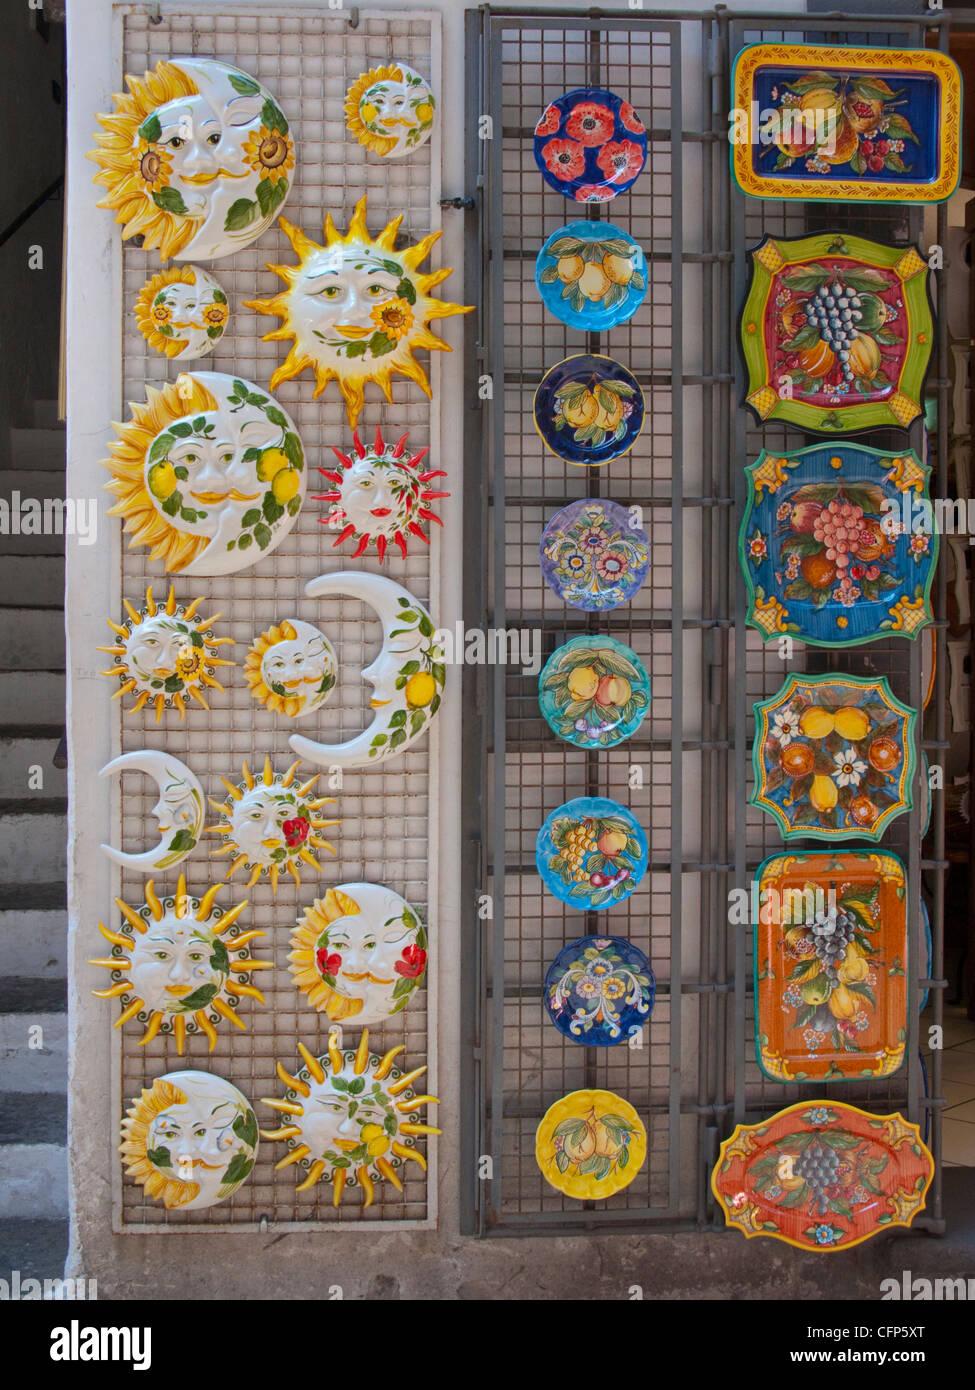 Souvenirs at a shop, Piazza Flavio Gioia, Amalfi, Amalfi coast, Unesco World Heritage site, Campania, Italy, Mediterranean Stock Photo